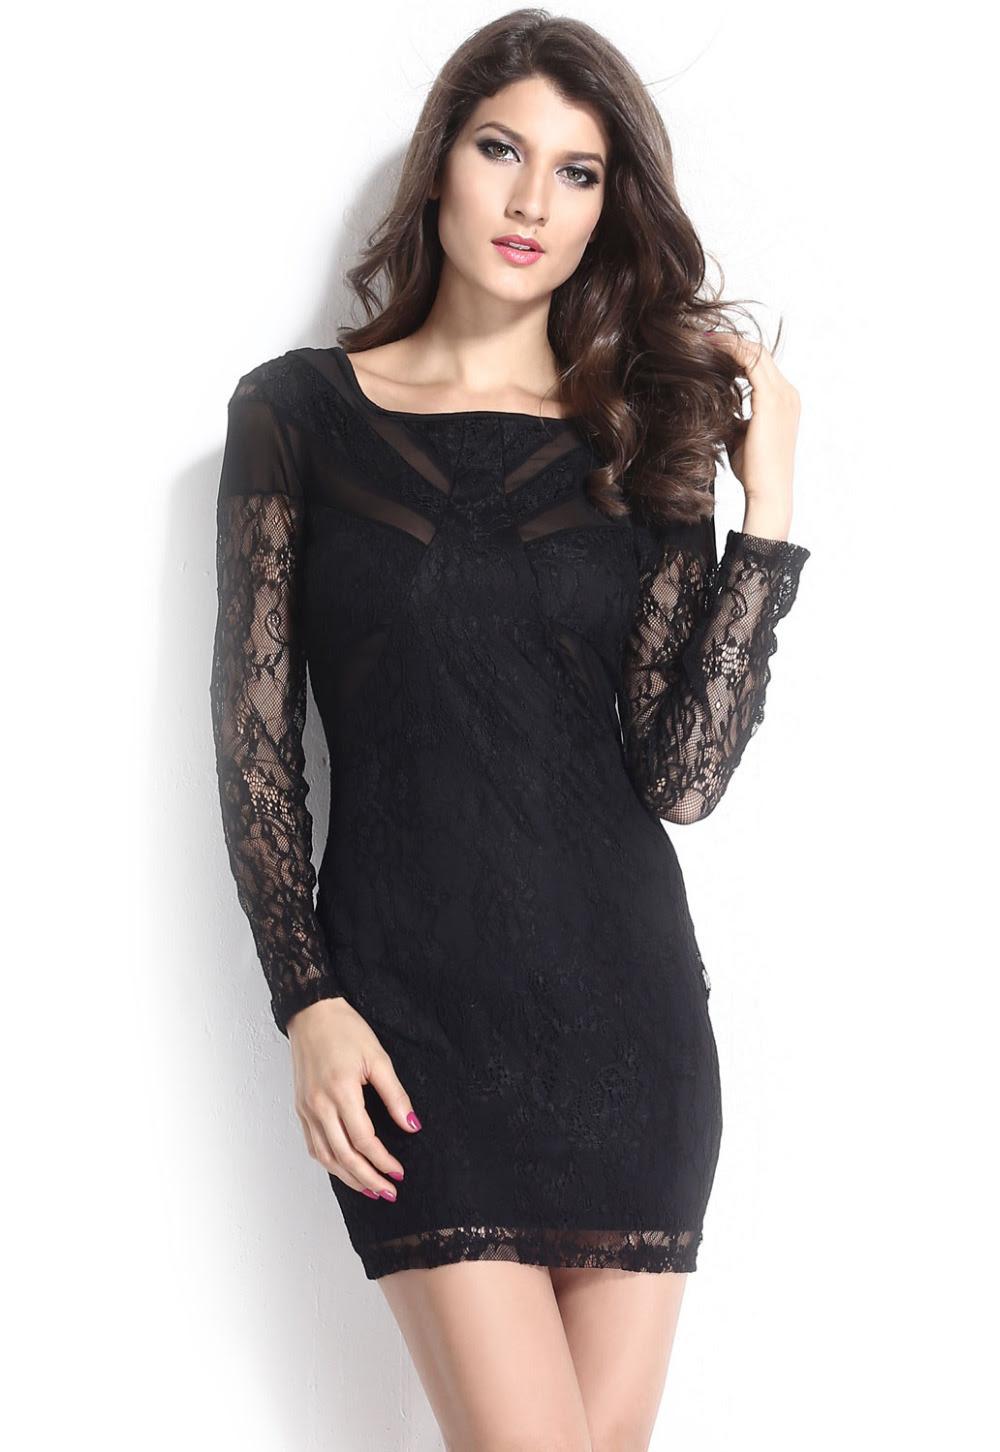 Mesh dresses bodycon long sleeve patchwork sew